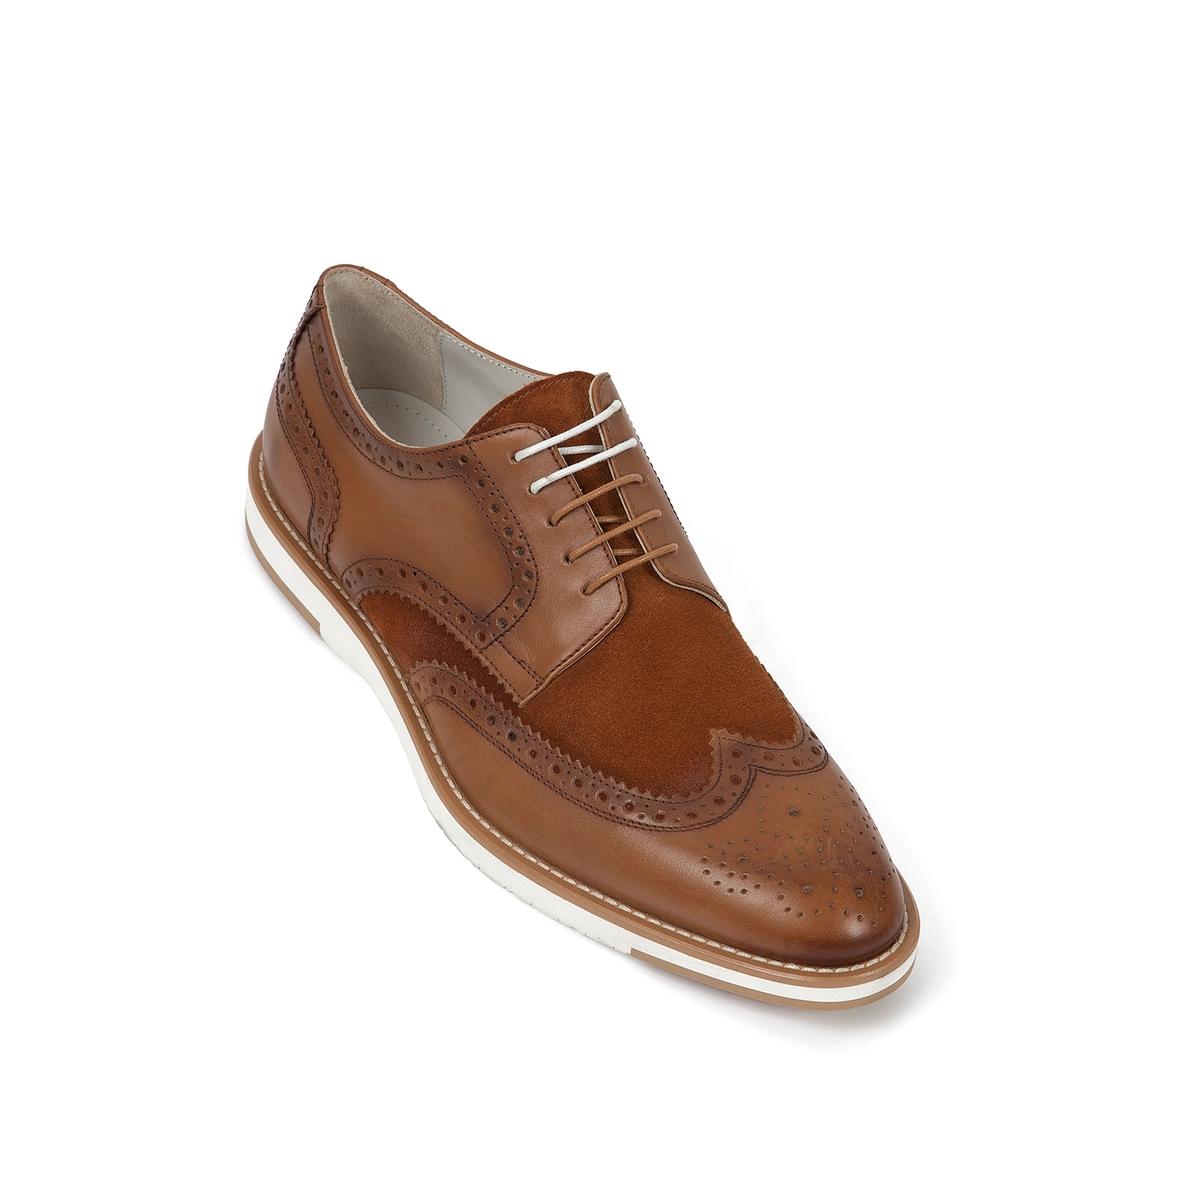 Ботинки-дерби кожаные Etienne